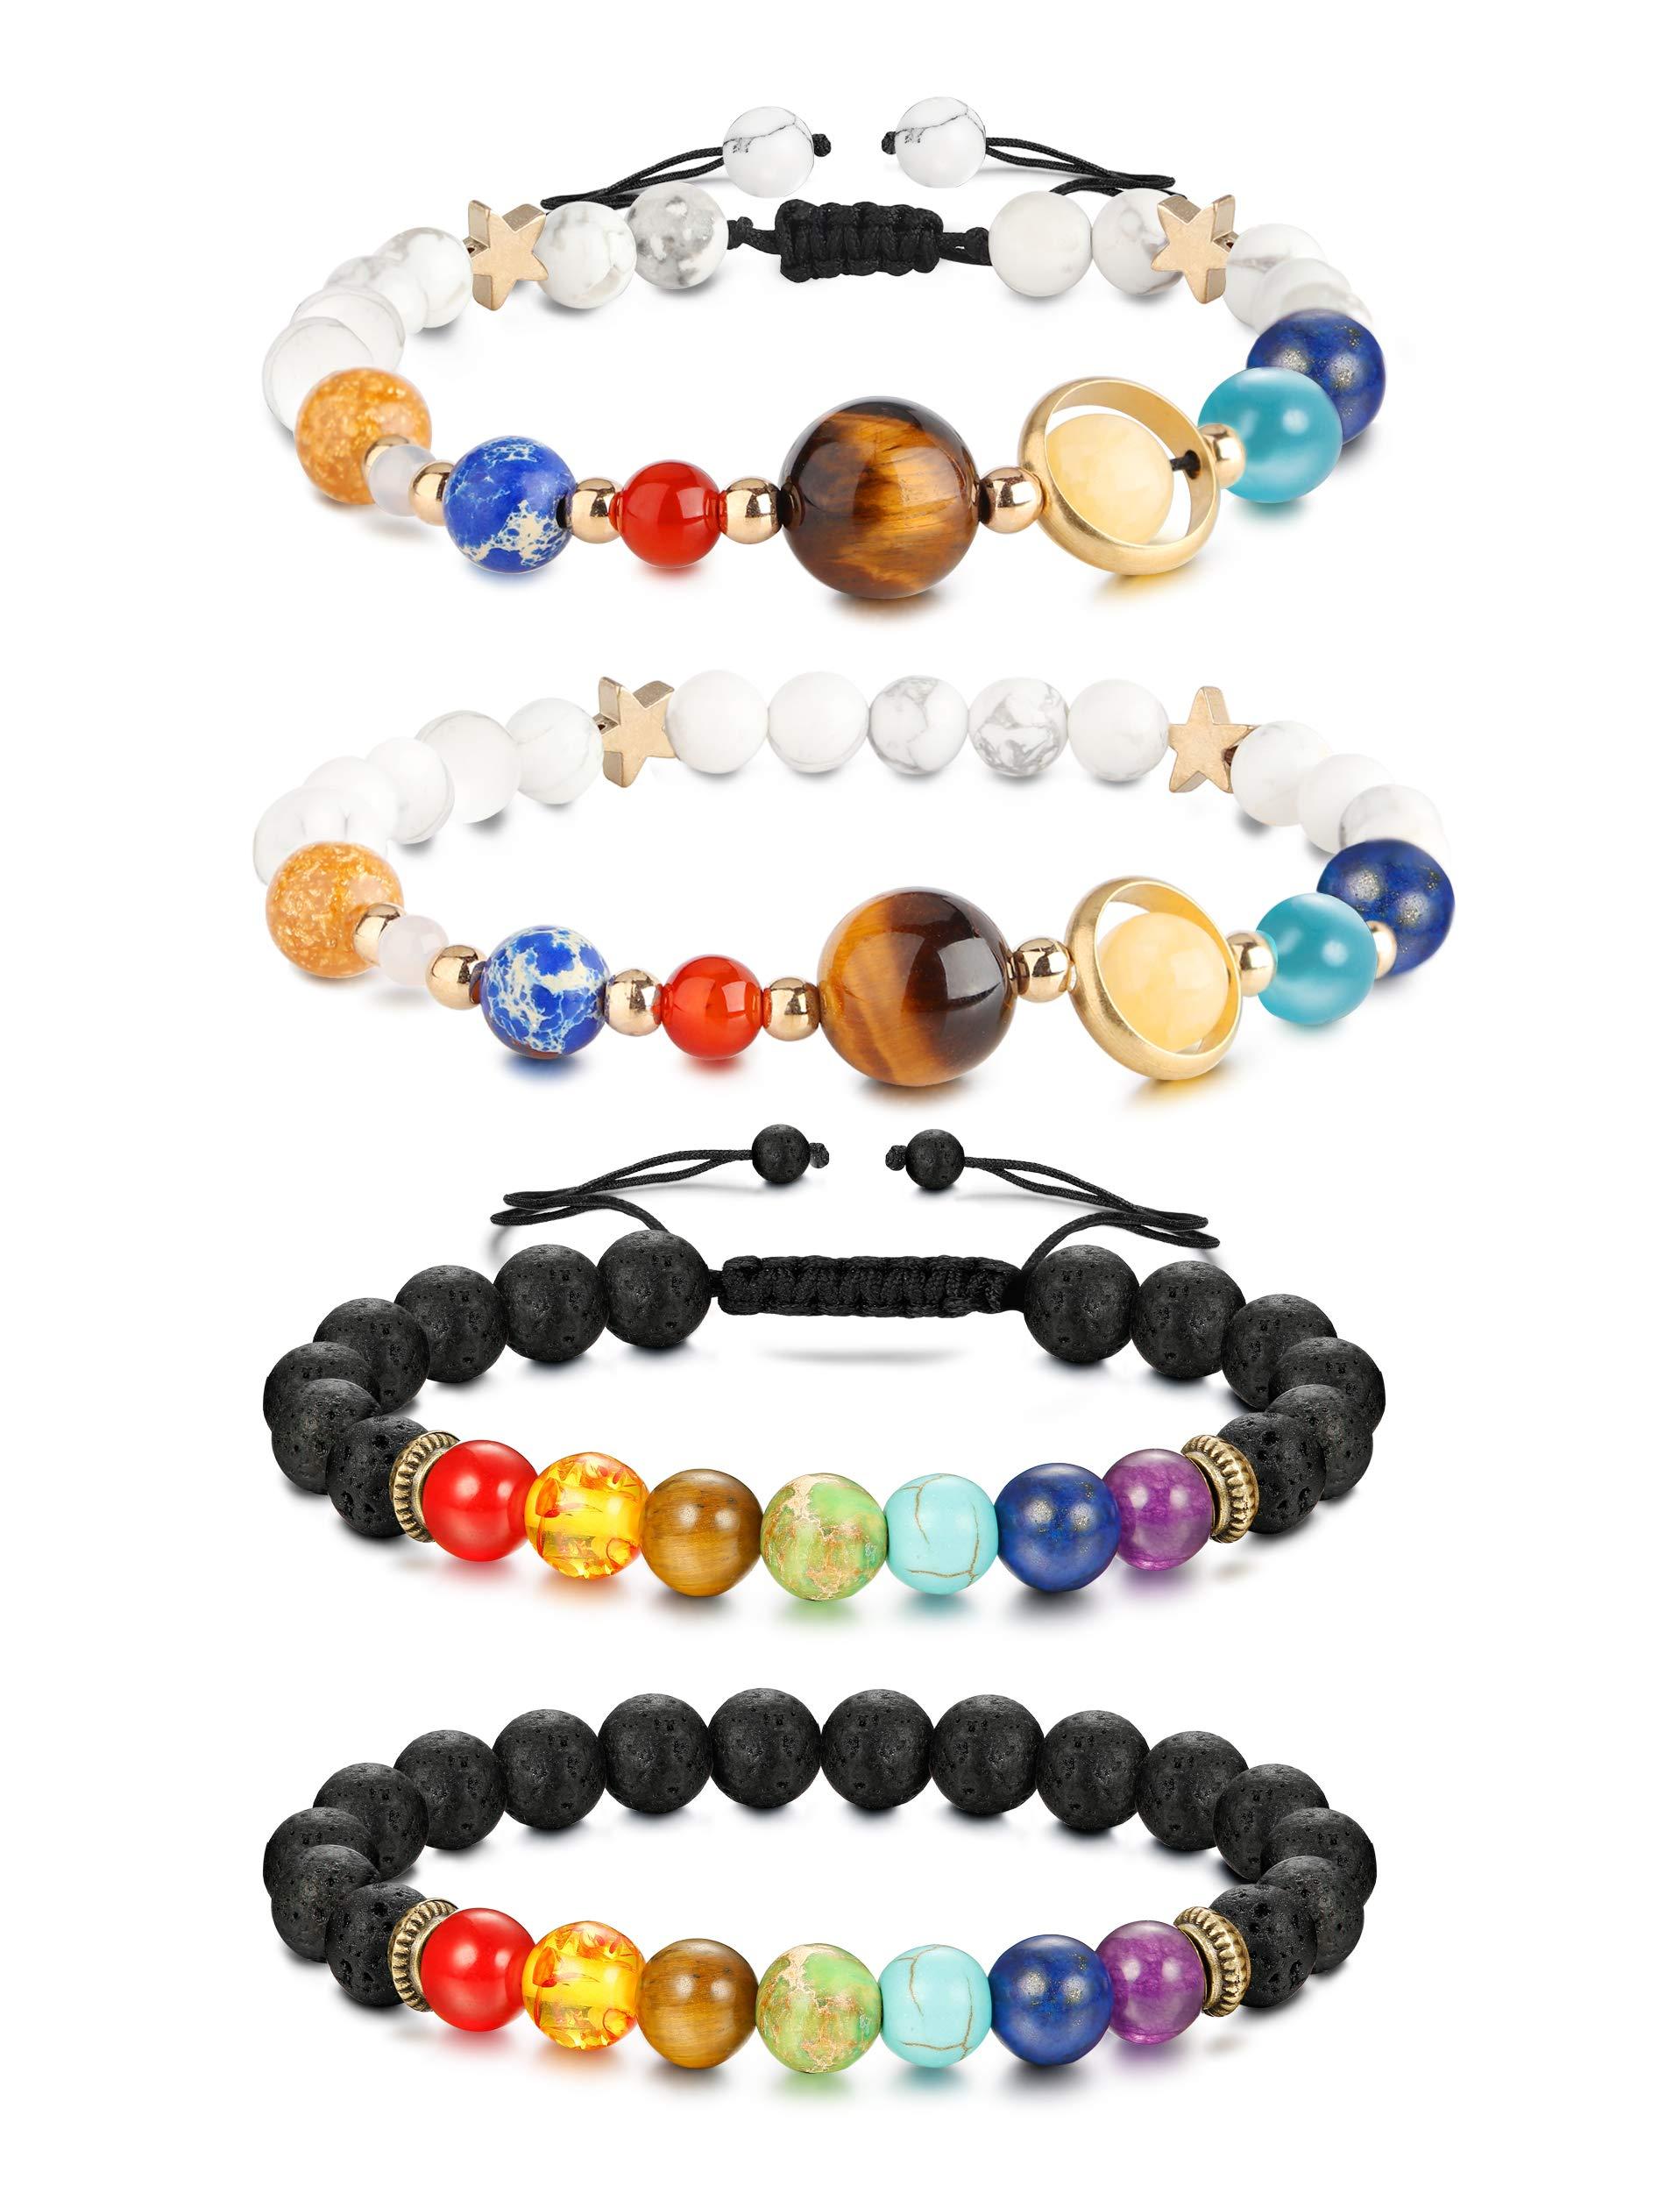 Finrezio 4 Pcs Bead Bracelets Women Men Solar System & Chakra Stone Diffuser Bracelets Set Aromatherapy Yoga Bracelet 8MM Beaded (B:4Pcs Bracelets)